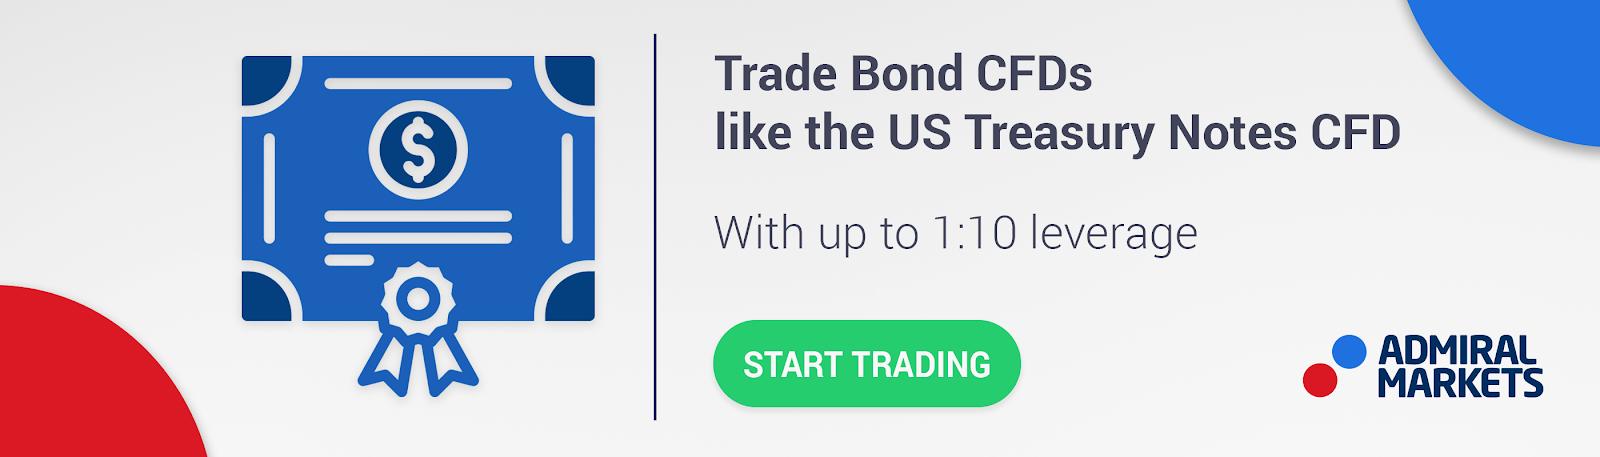 Trade Bond CFDs